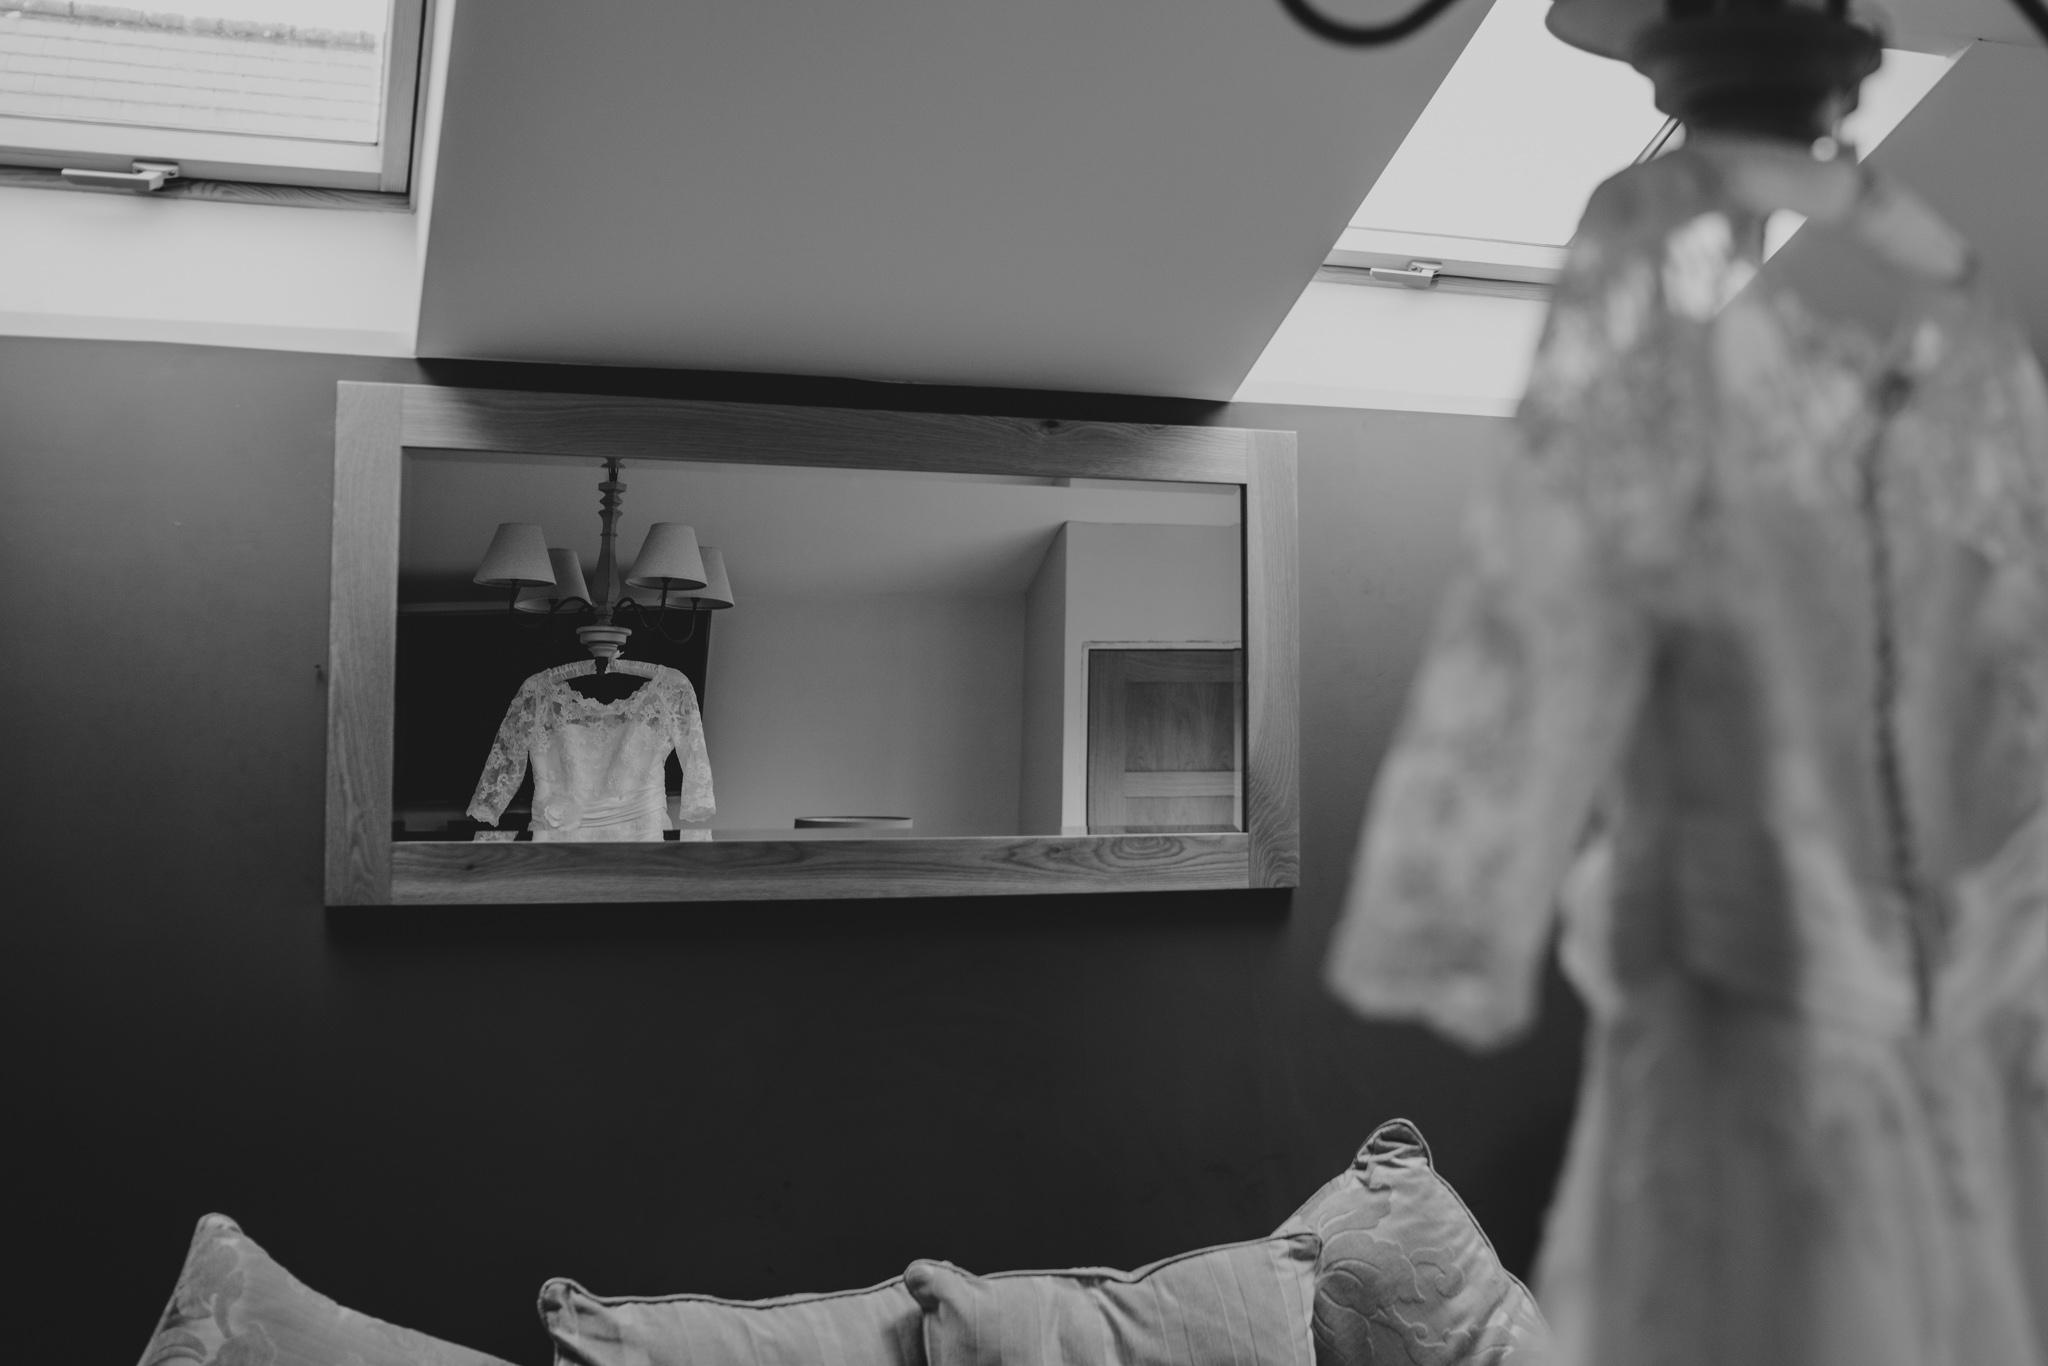 rhia-james-rustic-crabbs-barn-vintage-50s-retro-wedding-grace-elizabeth-colchester-essex-alternative-relaxed-wedding-family-photography-devon-suffolk-norfolk-essex (5 of 138).jpg